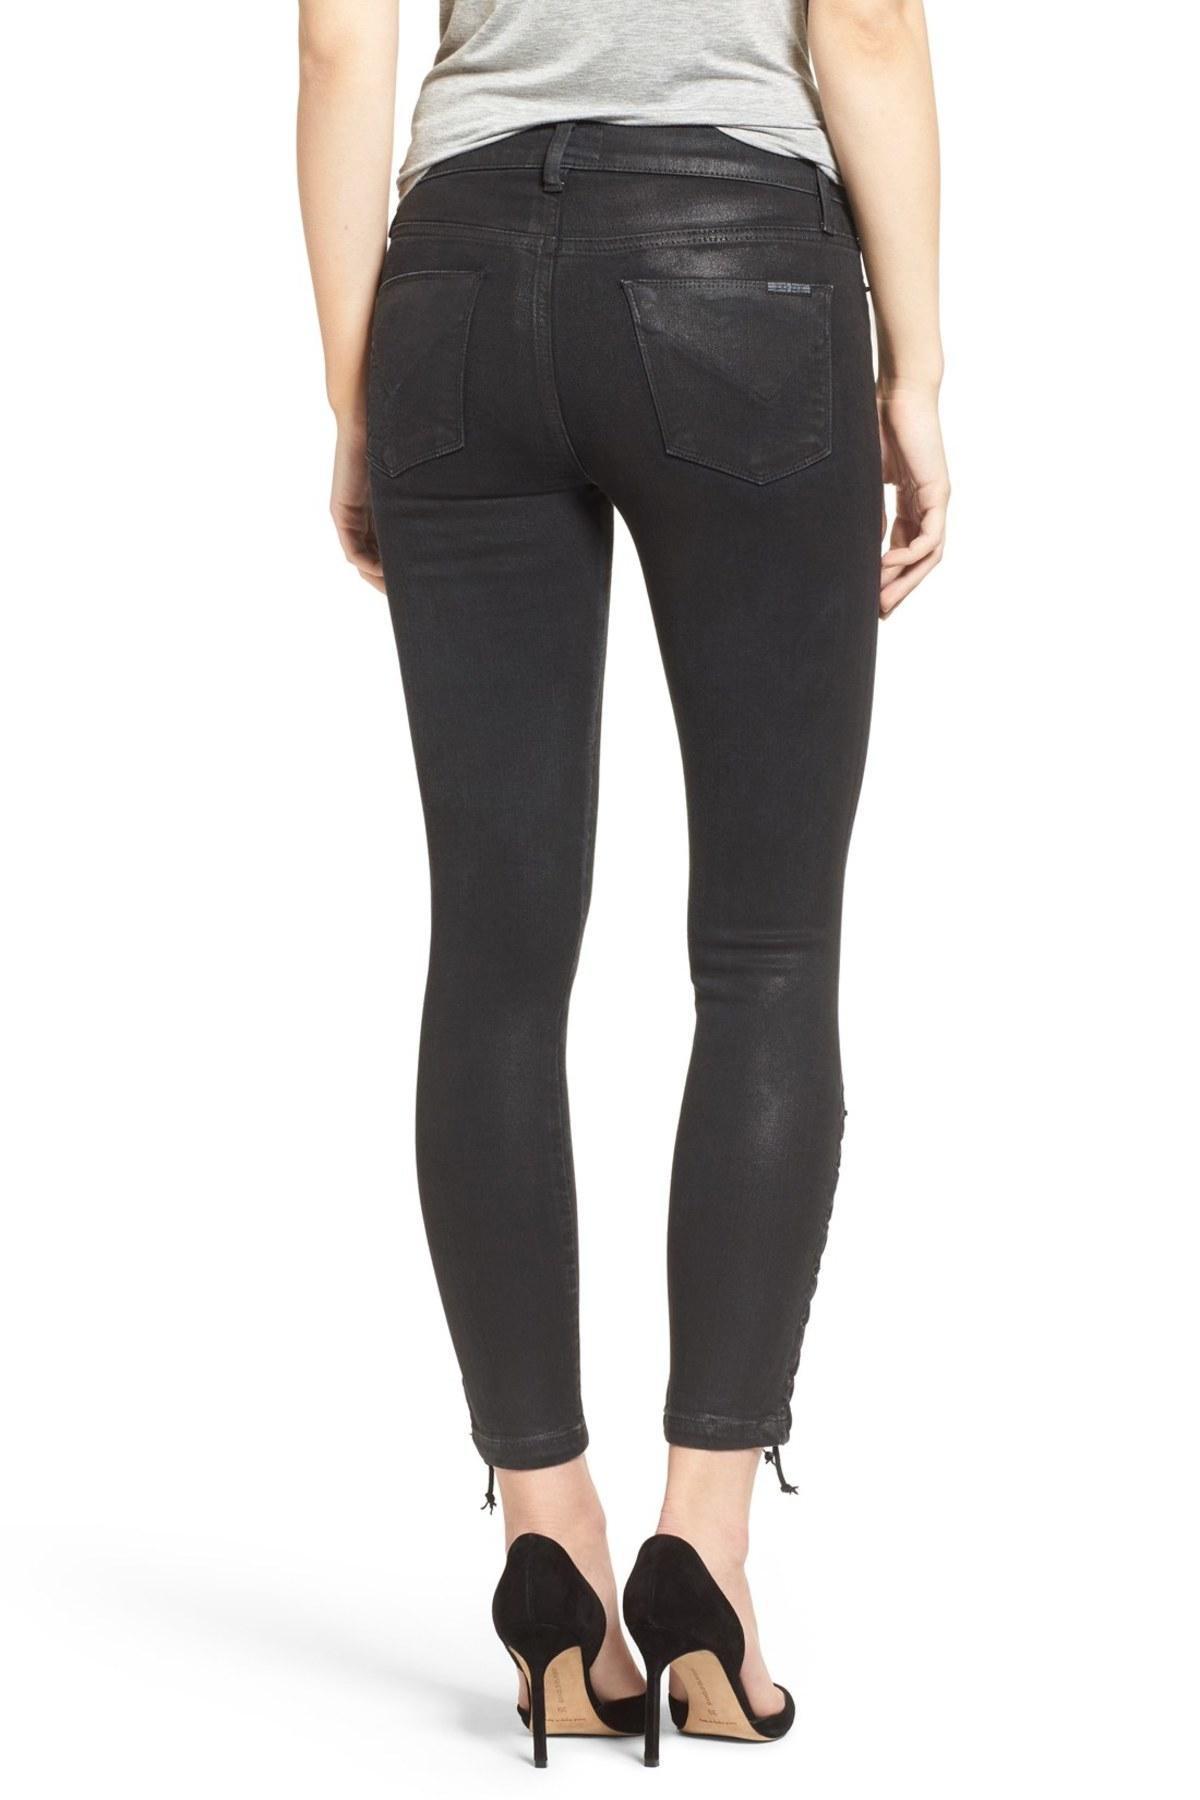 Hudson Jeans Womens Nix High Rise Lace Hem Crop 5 Pocket Jean